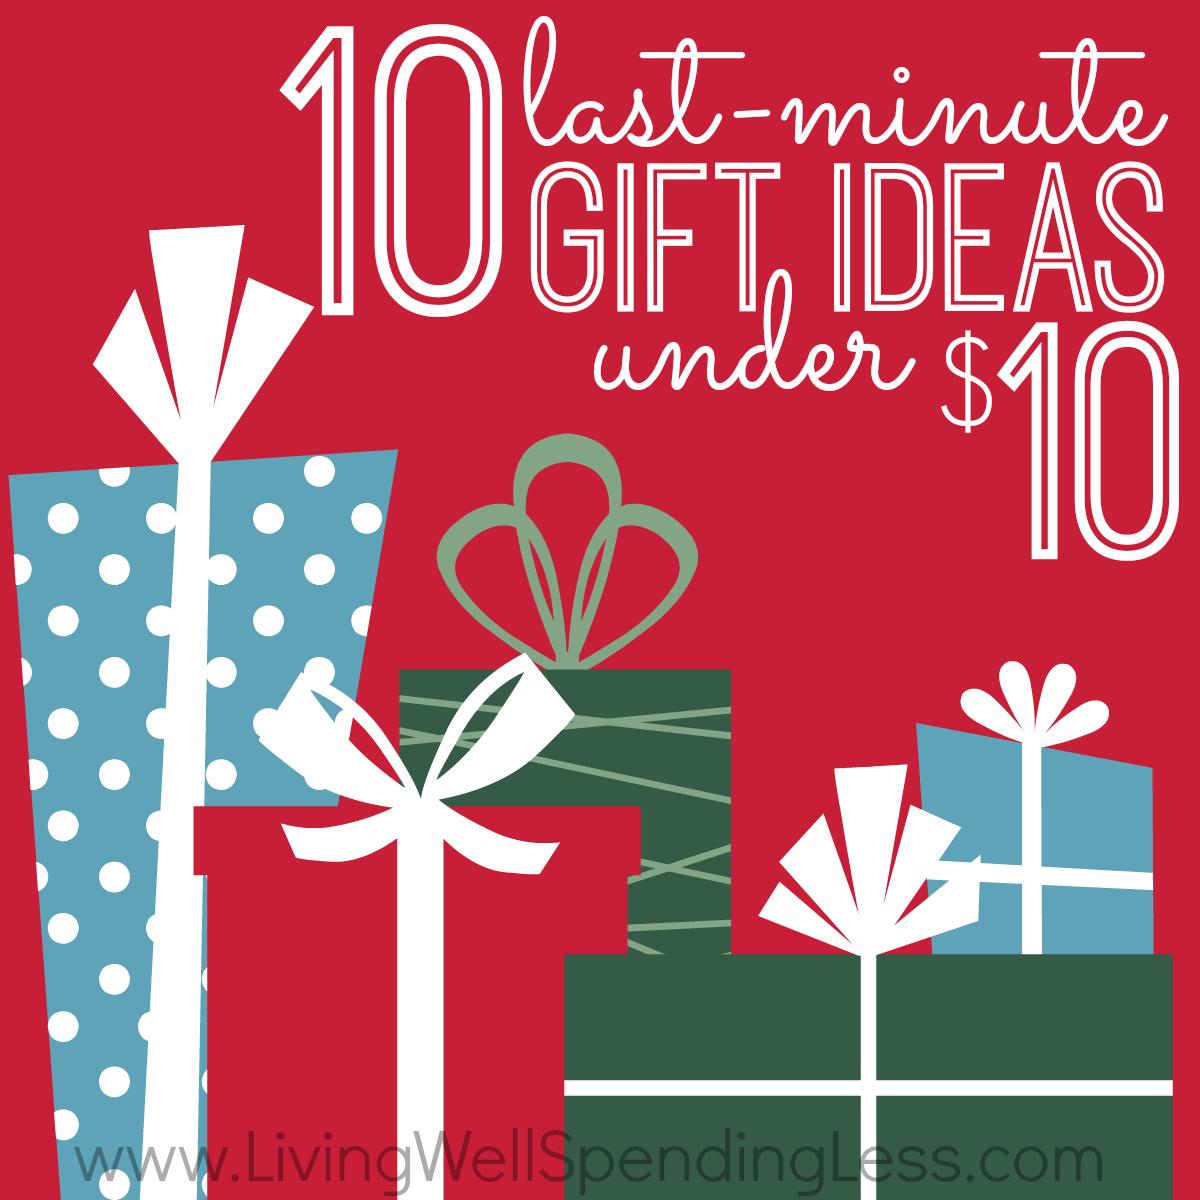 Cheap 33 Last Minute Quick Cheap Diy Christmas Gifts: 10 Last Minute Gift Ideas Under $10⎢Cheap Christmas Gifts